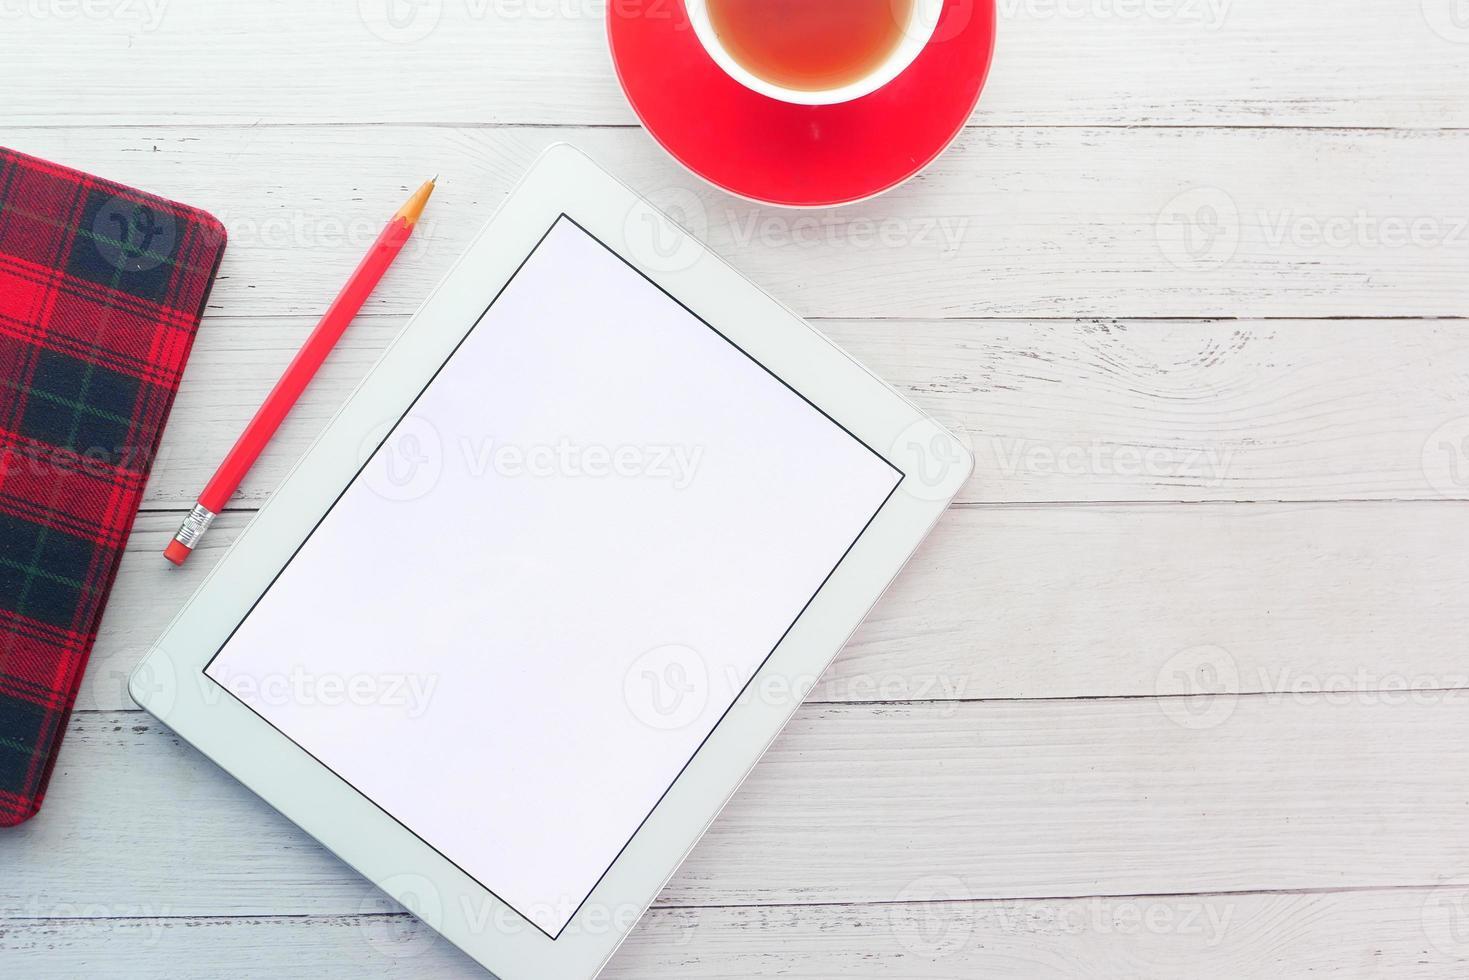 digitale tablet met kantoorbenodigdheden op tafel foto